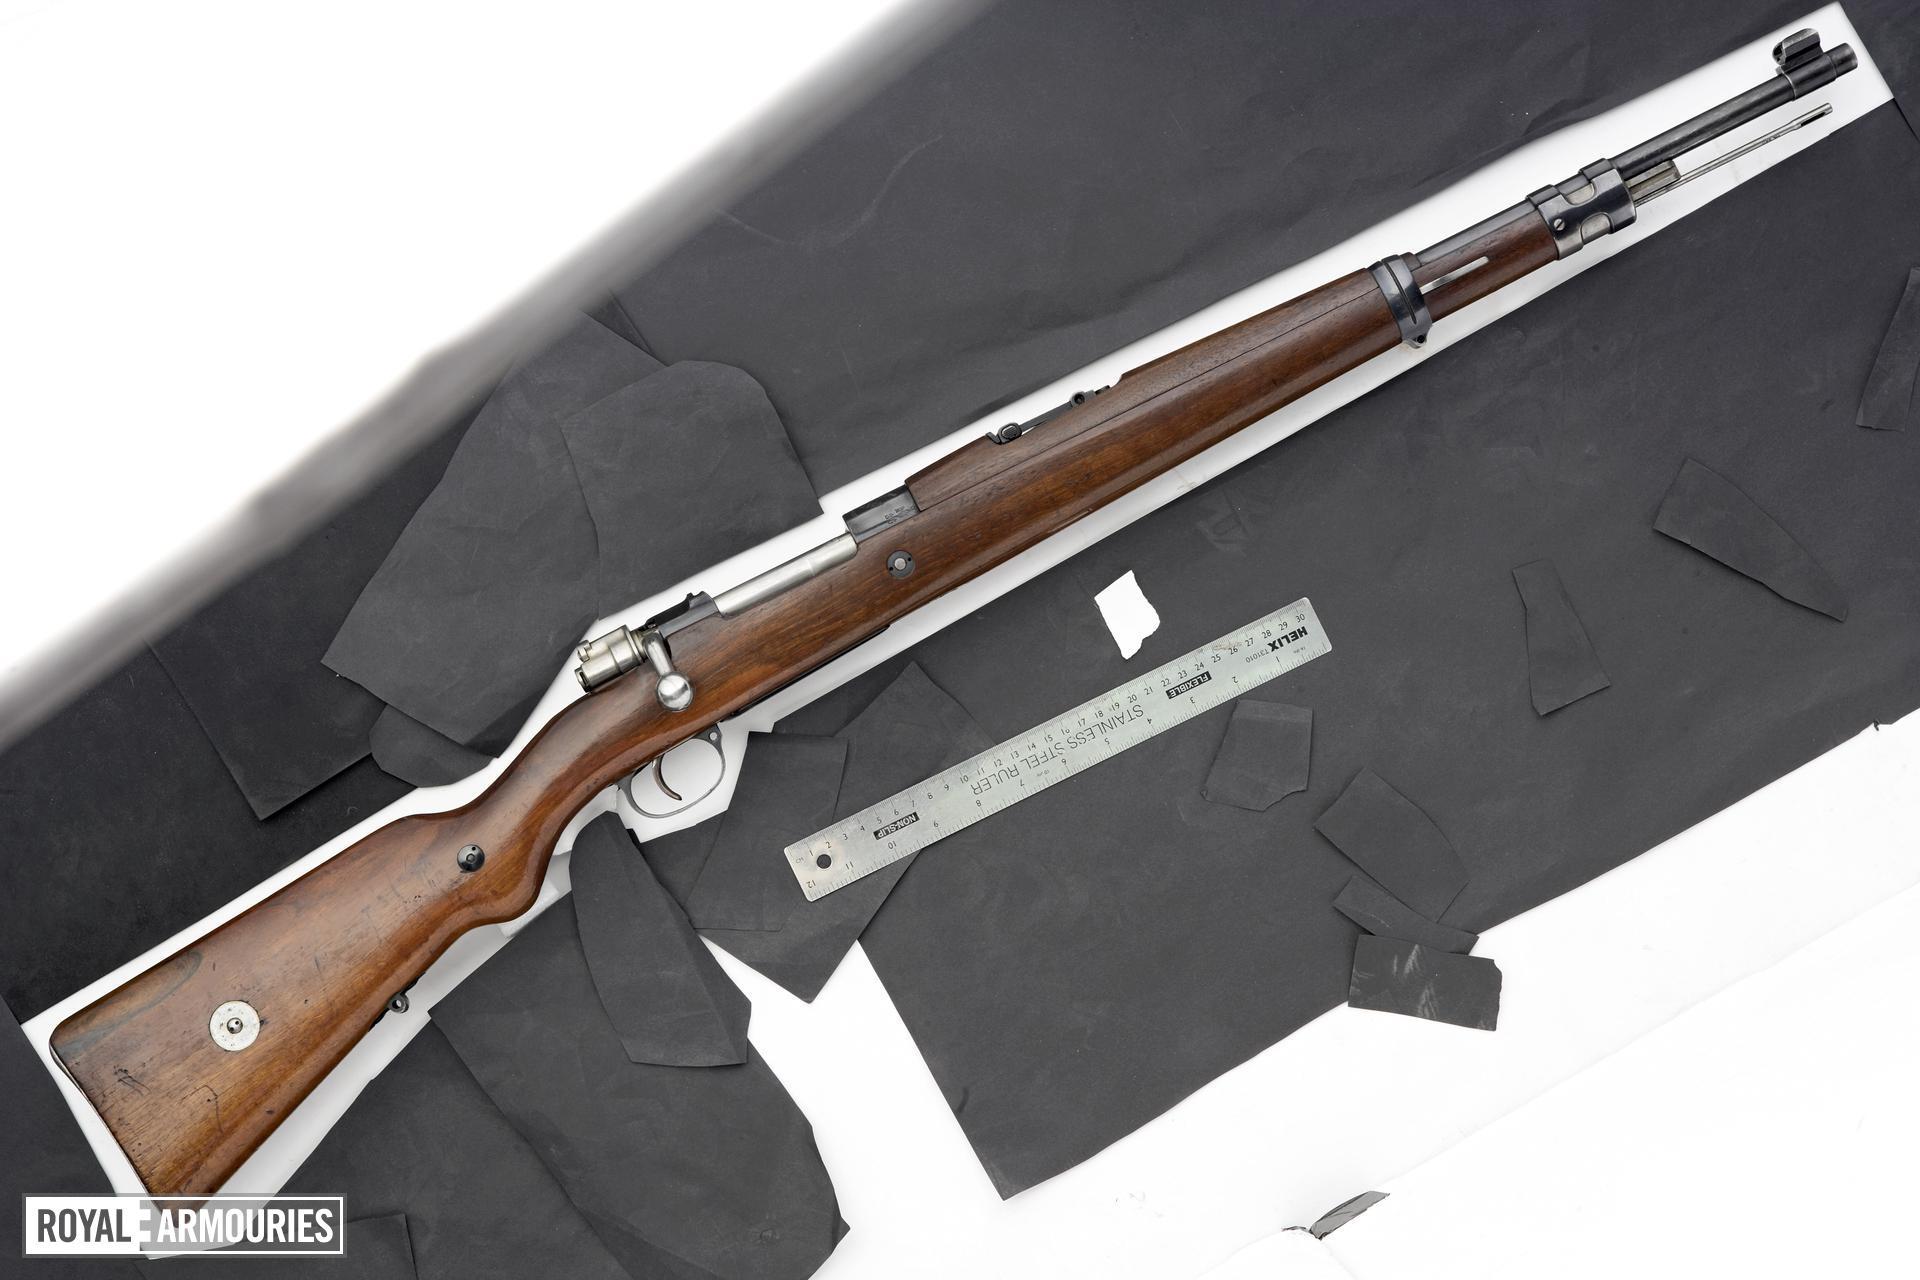 Centrefire self-loading rifle - Johnson Model 1941